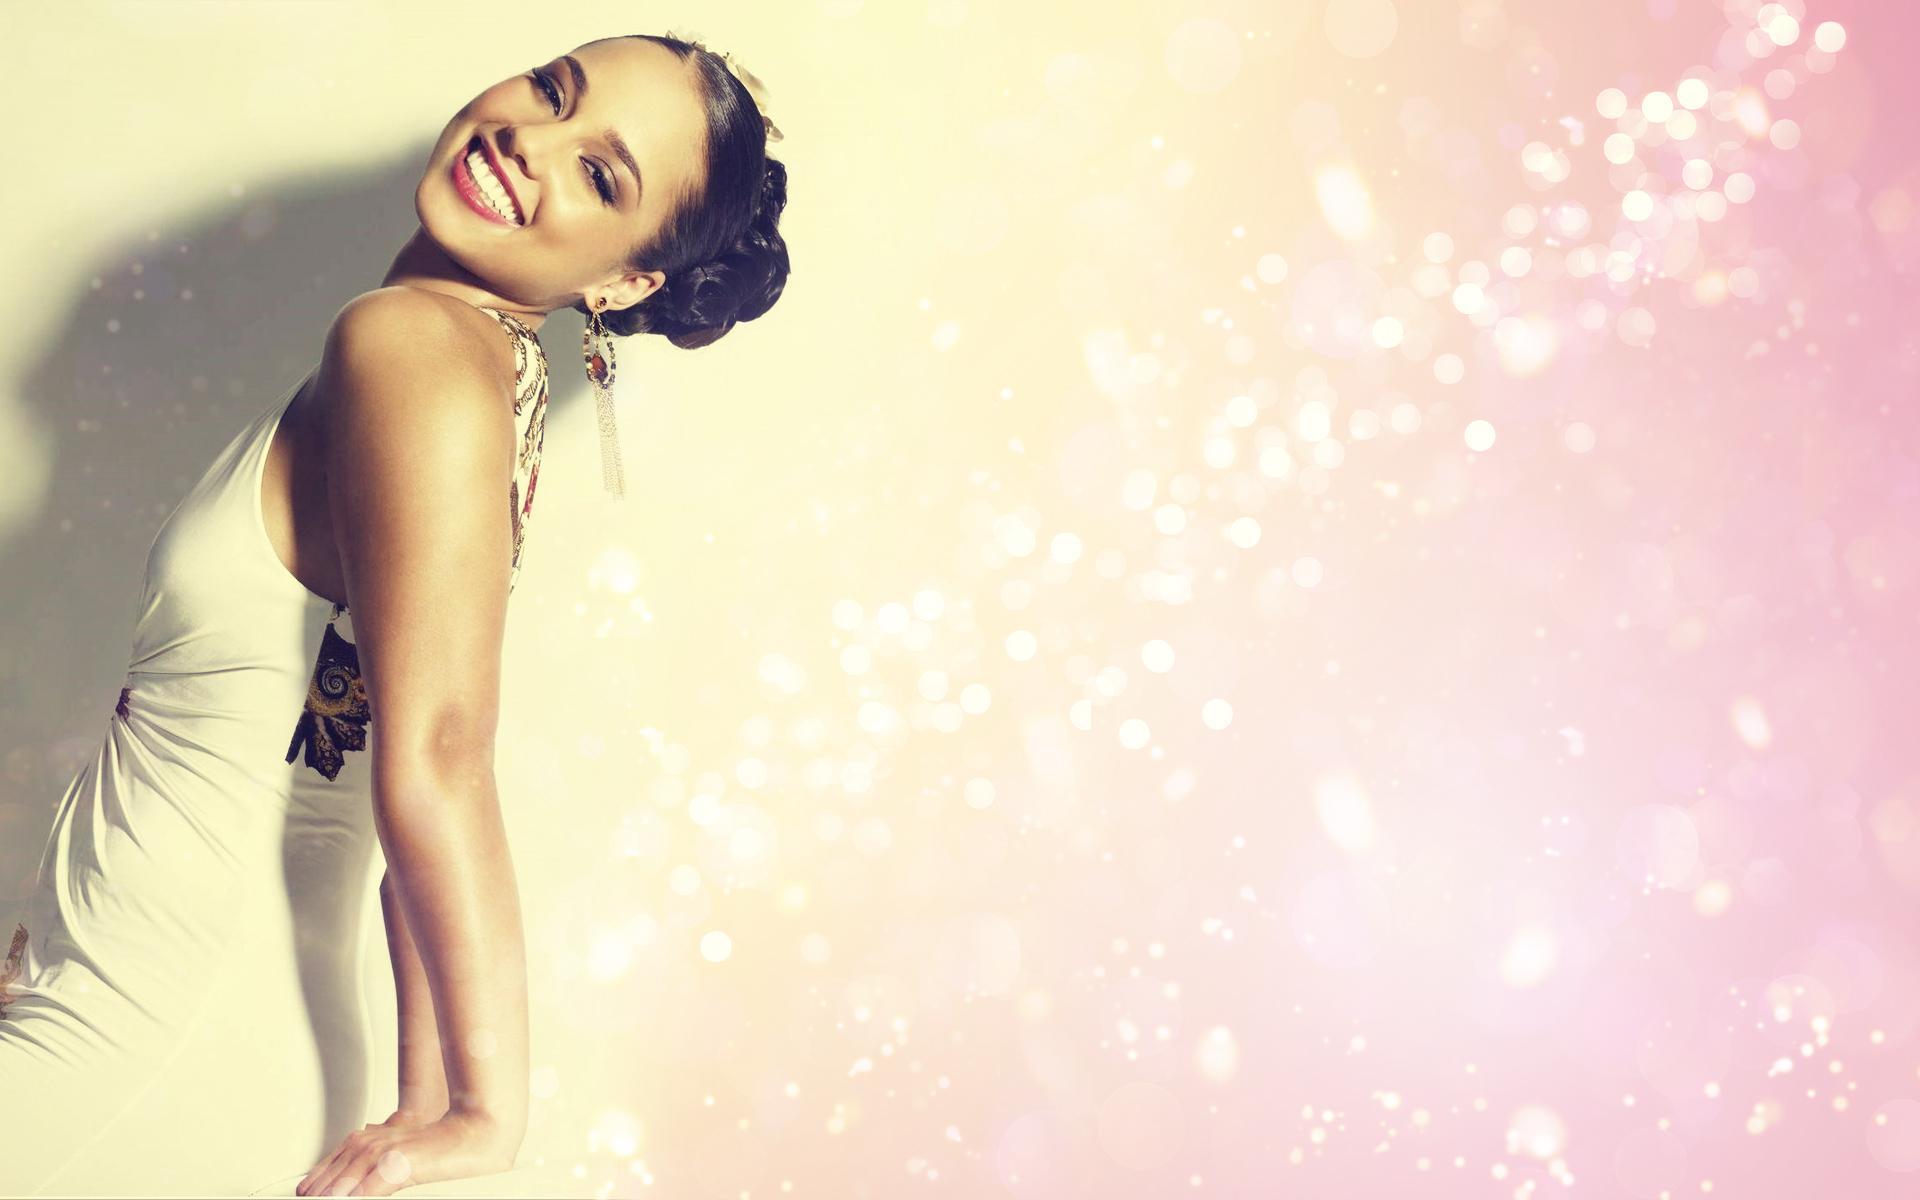 Alicia Keys Wallpaper by textureclad